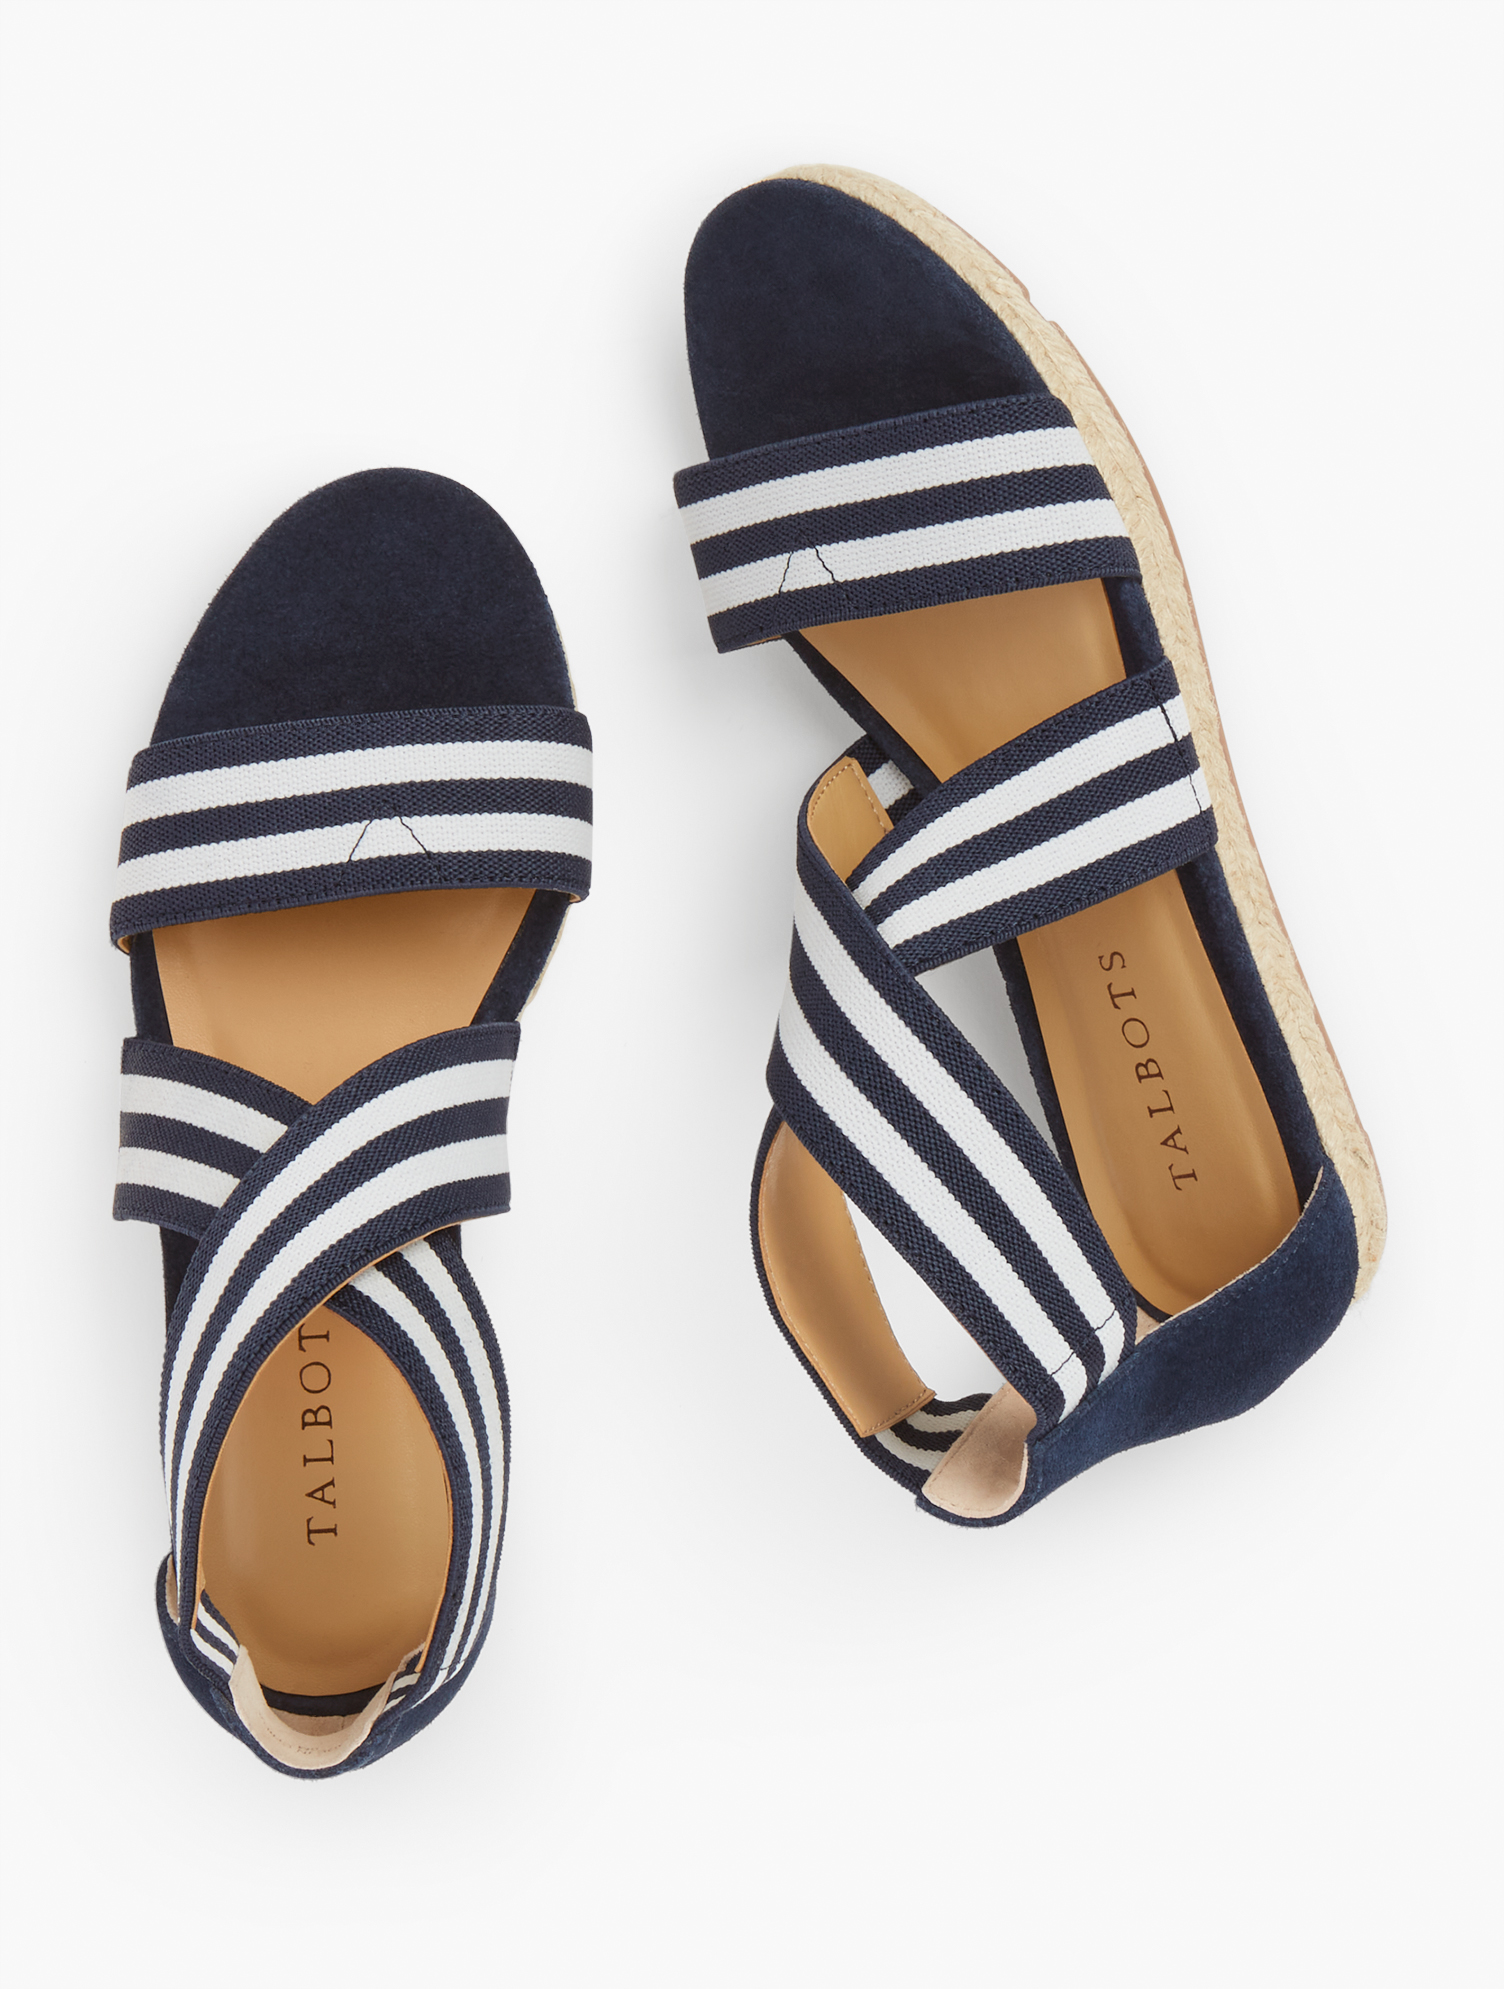 1950s Style Shoes | Heels, Flats, Boots Illyssa Espadrille Flats - Navy BlueWhite - 11M Talbots $99.00 AT vintagedancer.com